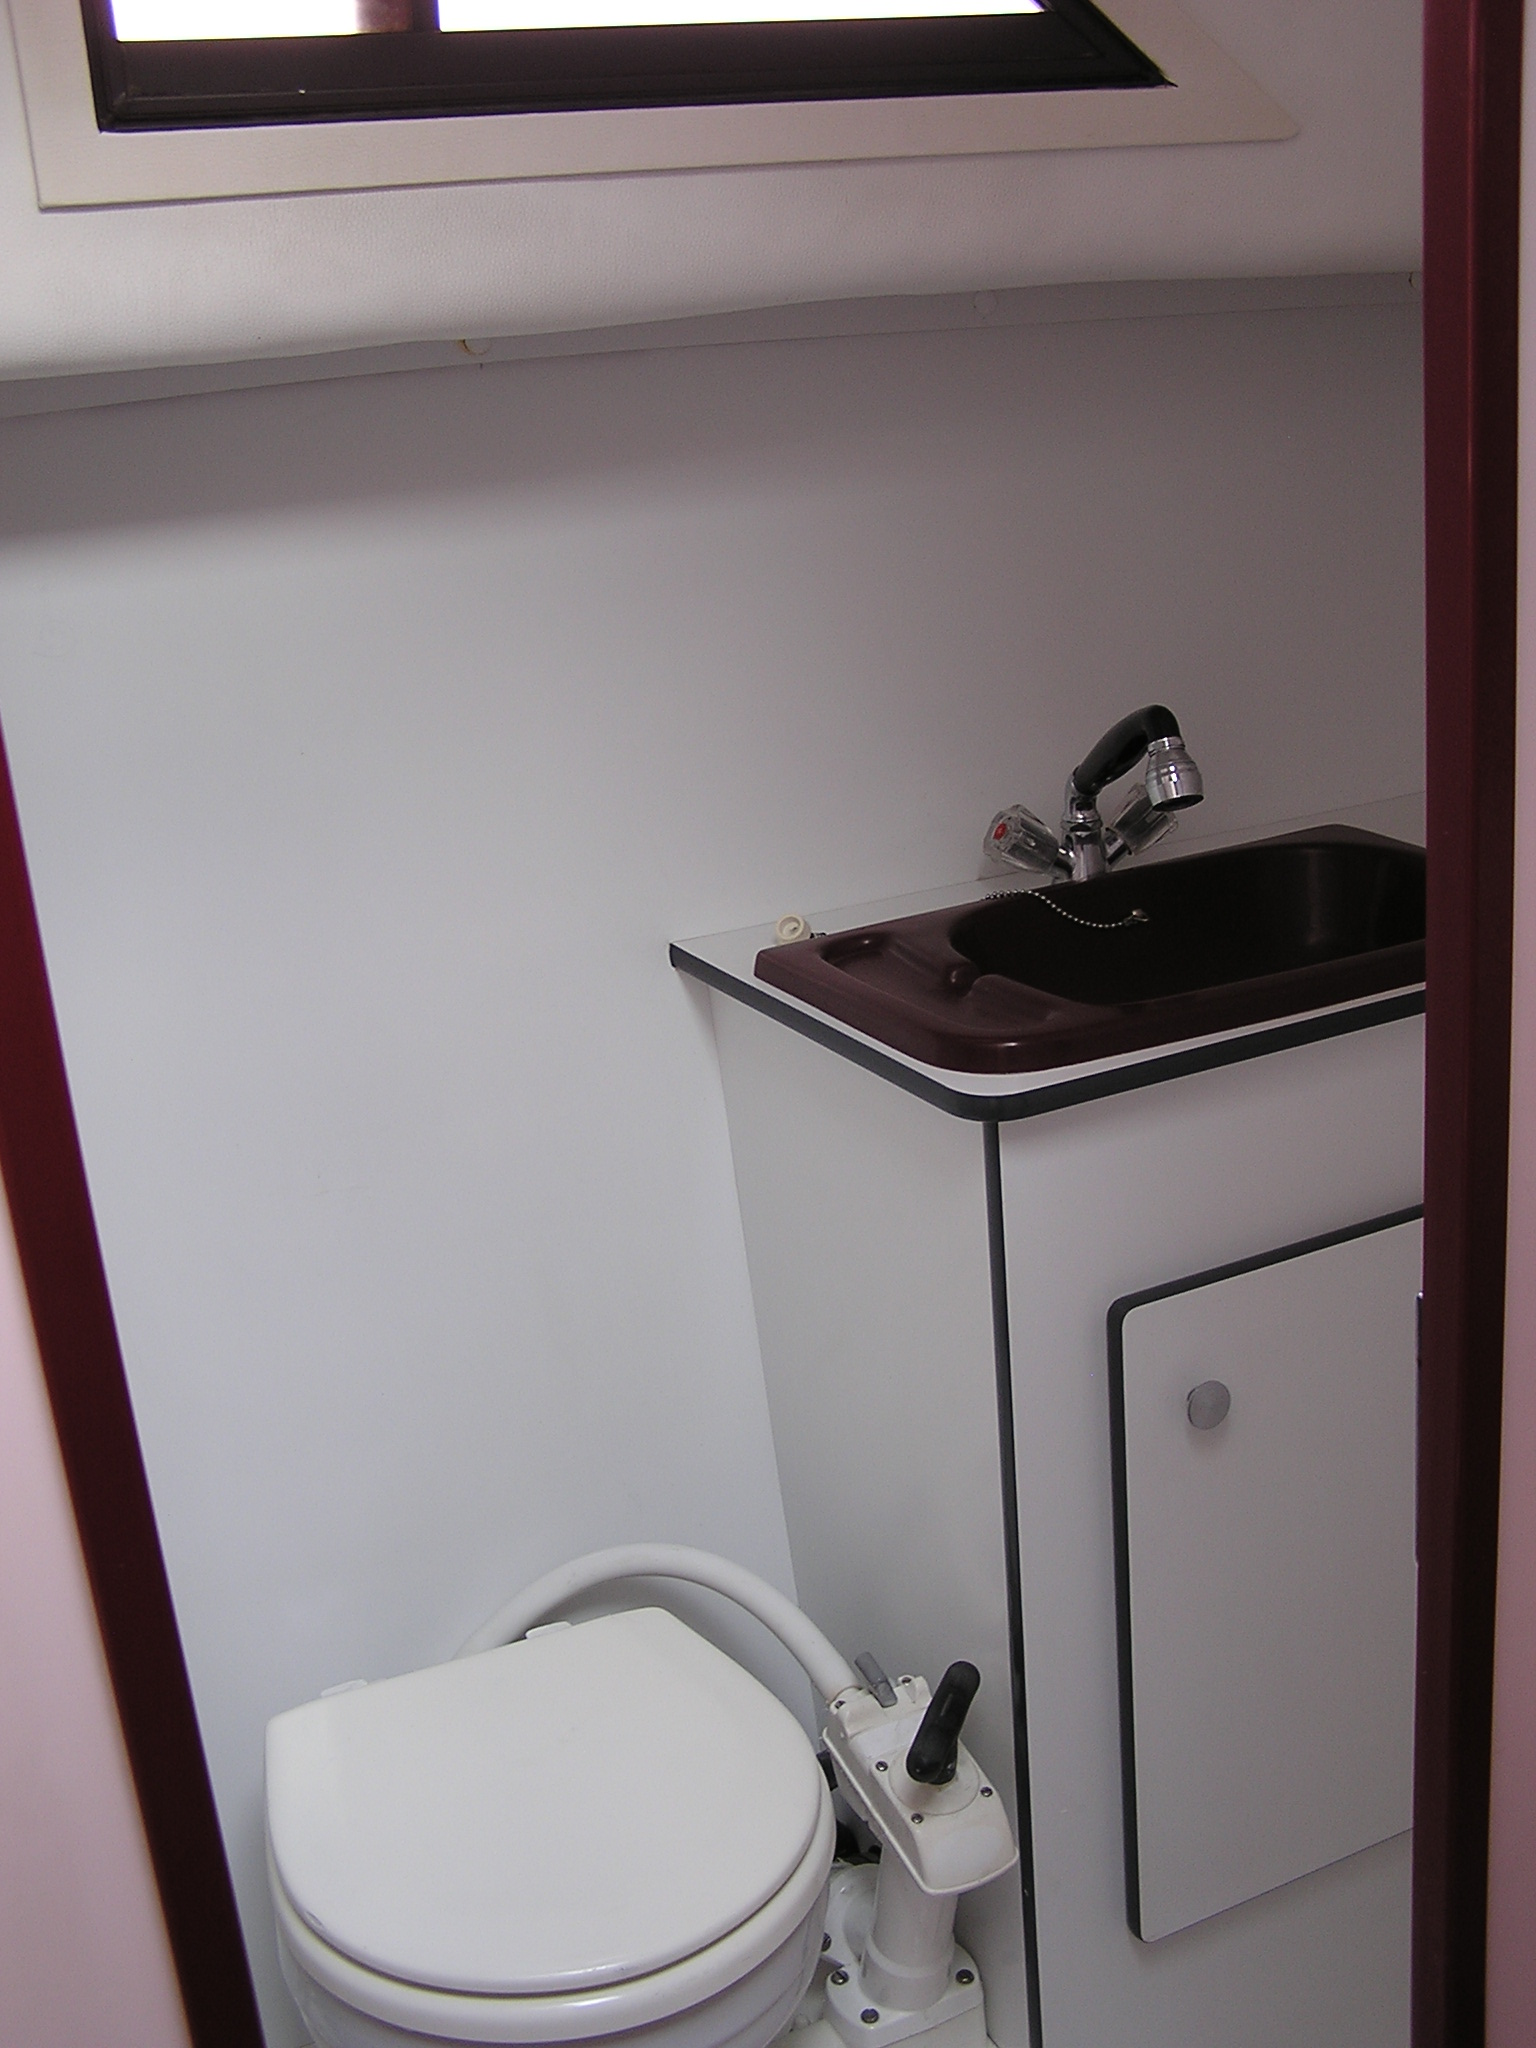 Nicols Sedan 1000 vue salle d eau Inter Croisieres